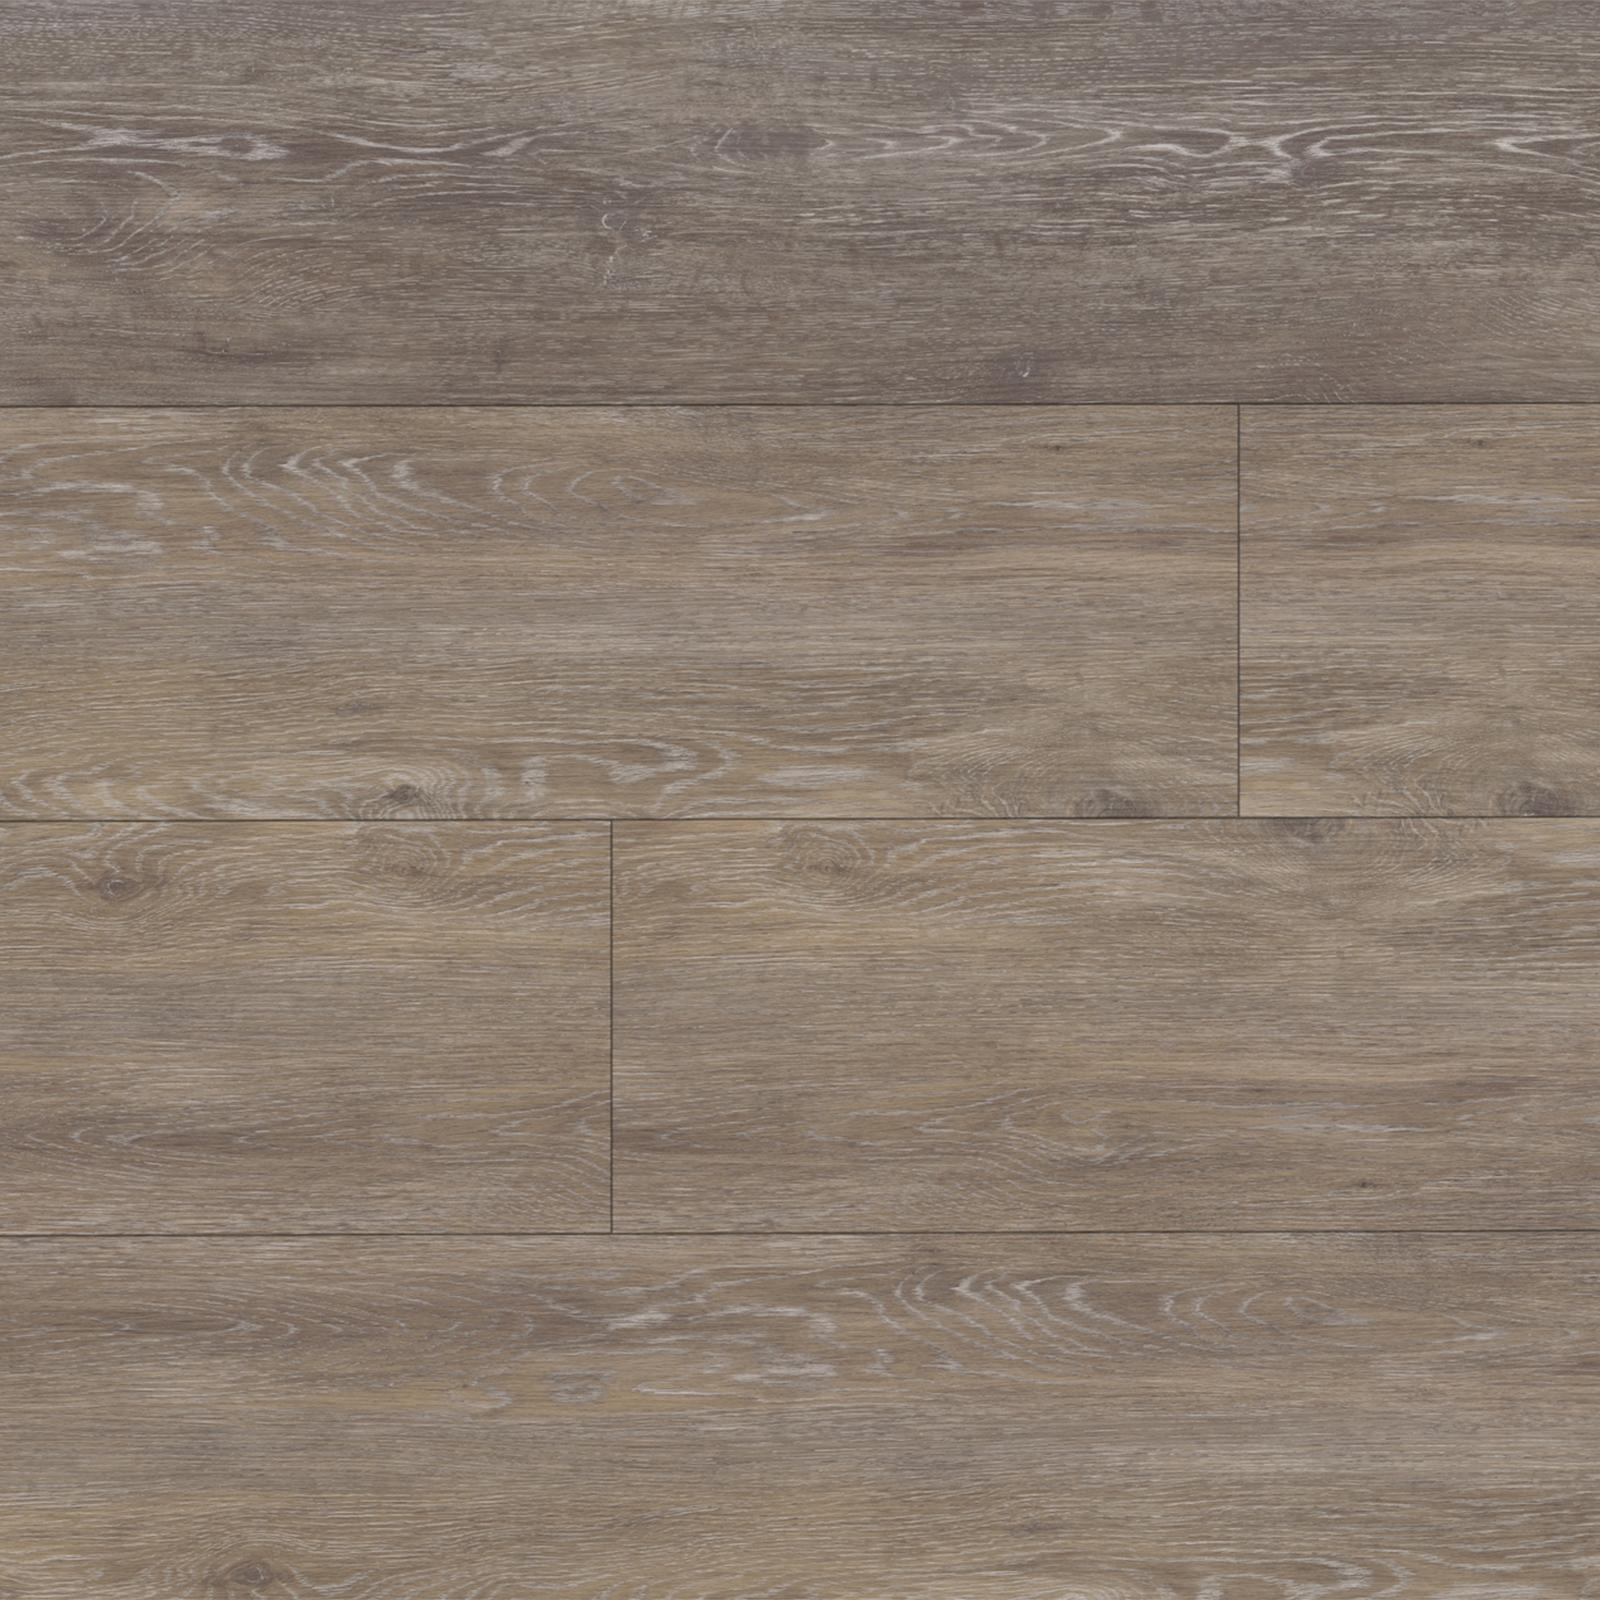 vinylboden pvc klick dielen bodenbelag royal chalet eiche landhausdiele 1 stab ebay. Black Bedroom Furniture Sets. Home Design Ideas